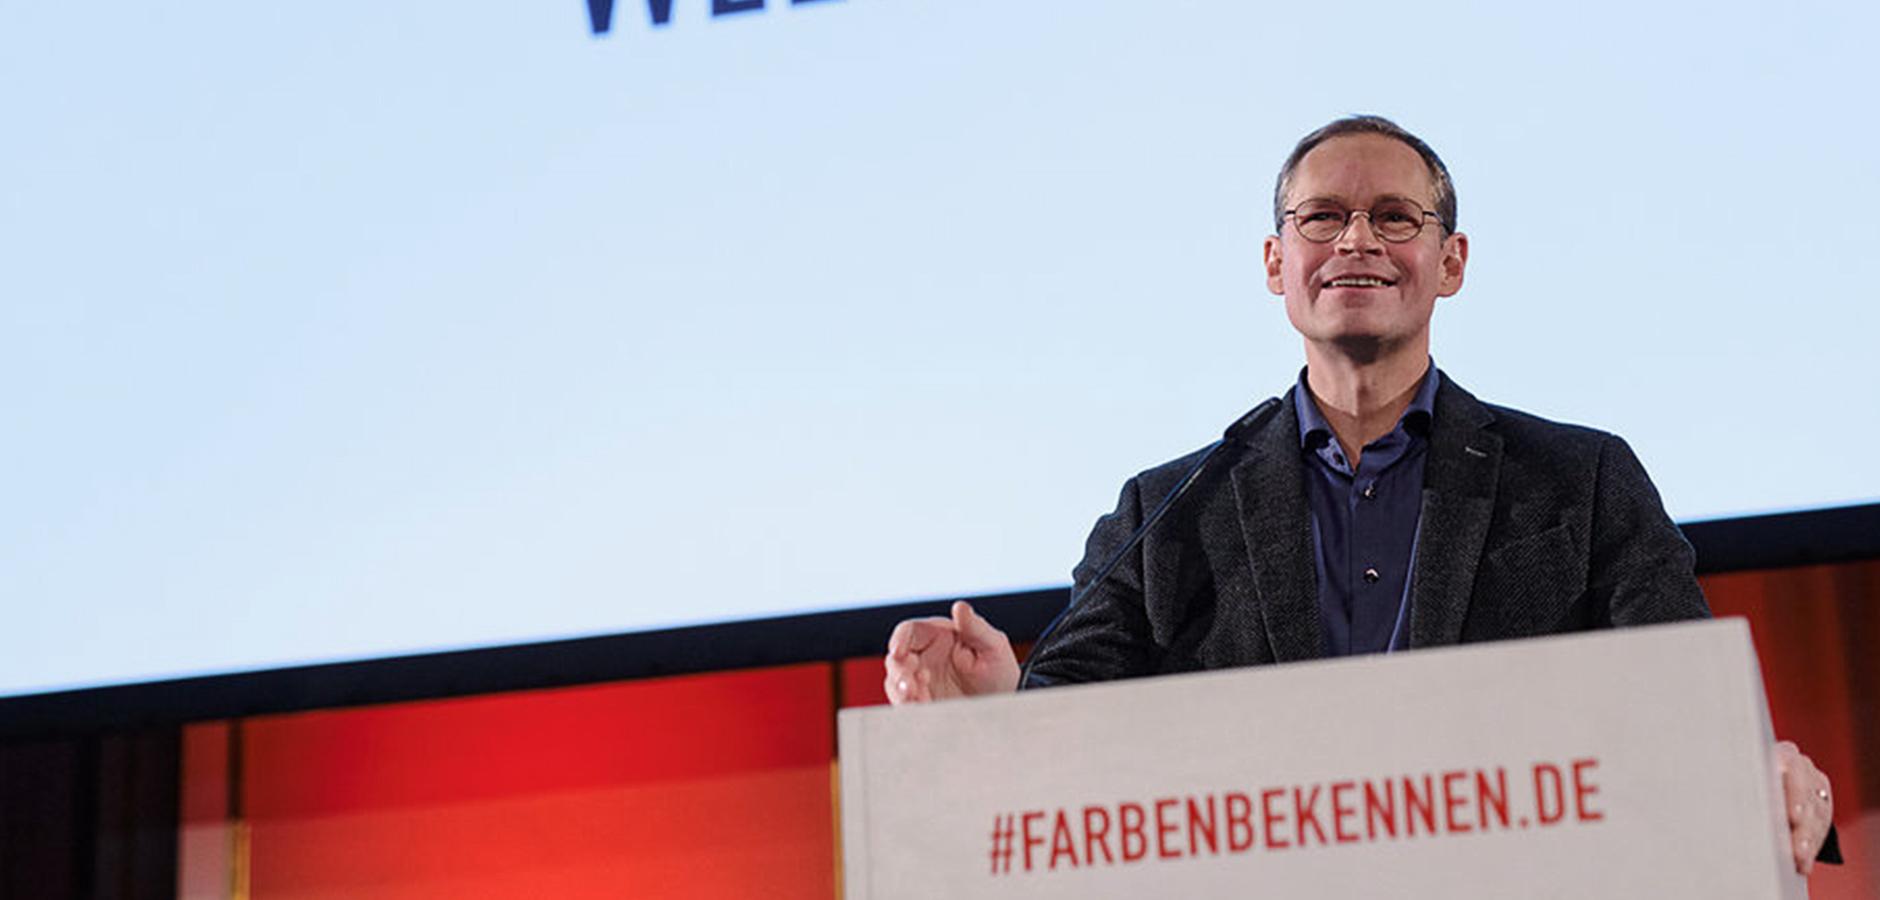 be Berlin: Berlin Partner - #farbenbekennen - Weihnachtsfest